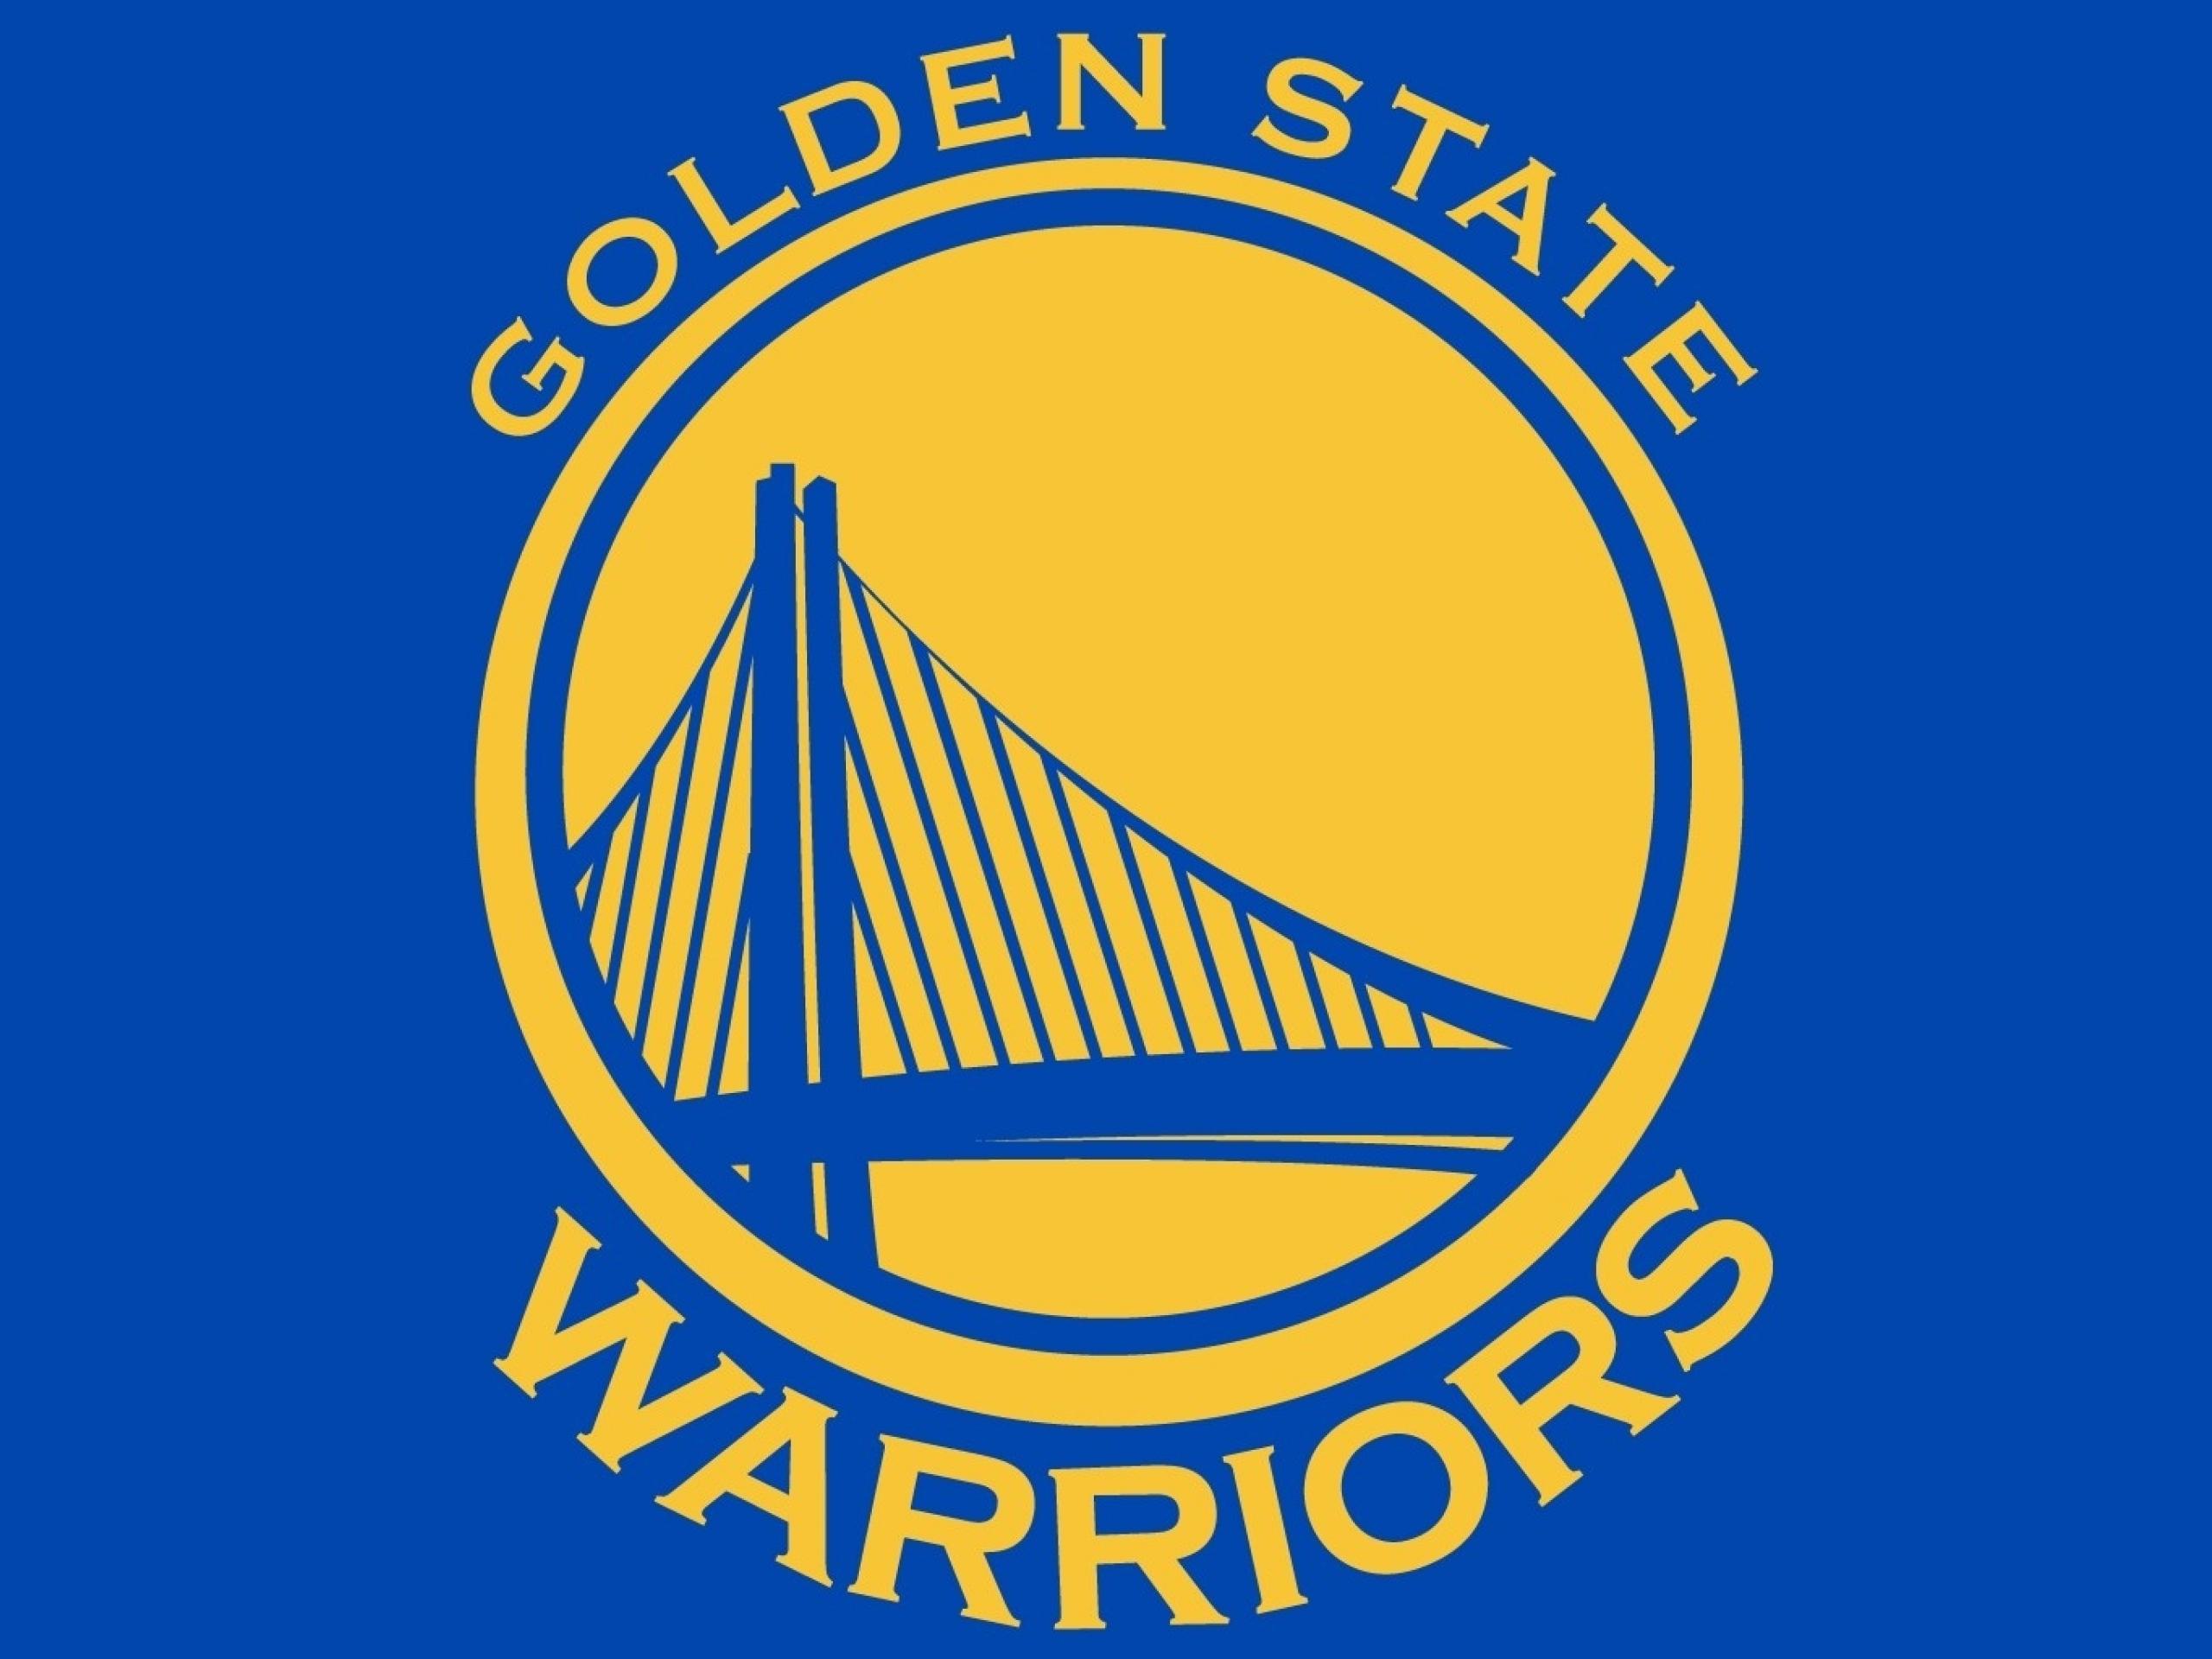 Golden State Warriors Wallpaper - WallpaperSafari